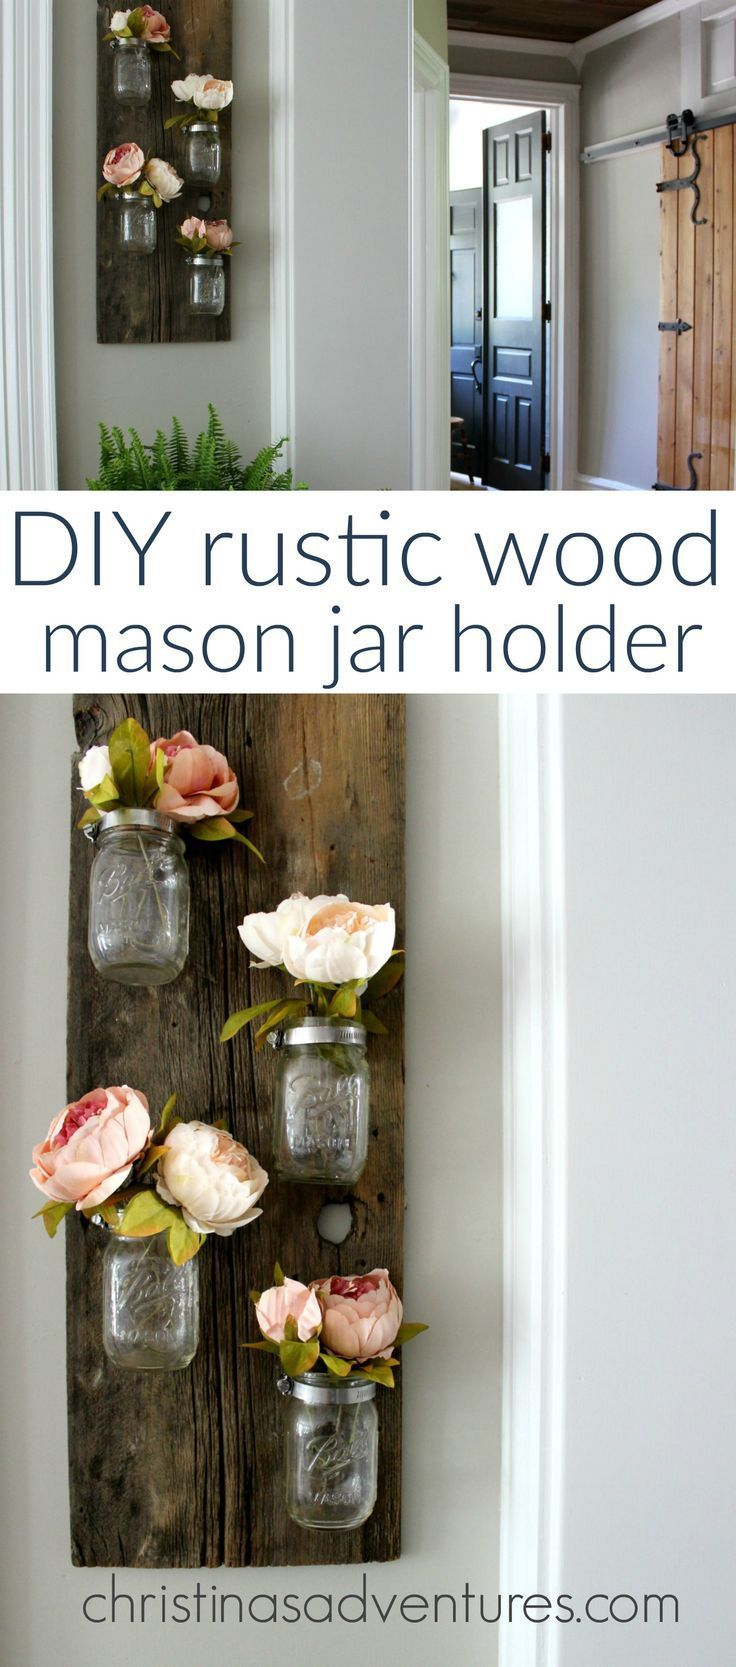 DIY rustic wood mason jar holder